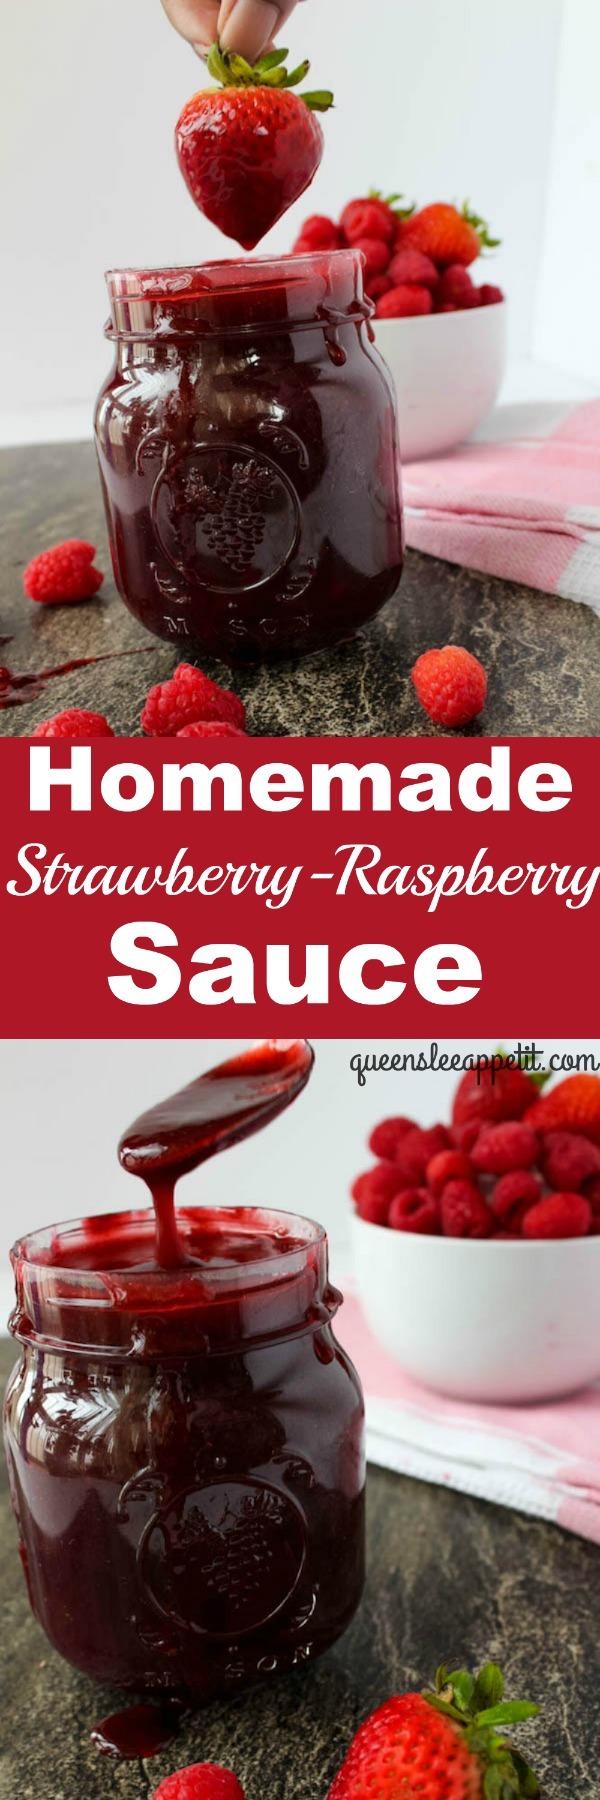 Strawberry-Raspberry Sauce recipe on queensleeappetit.com!